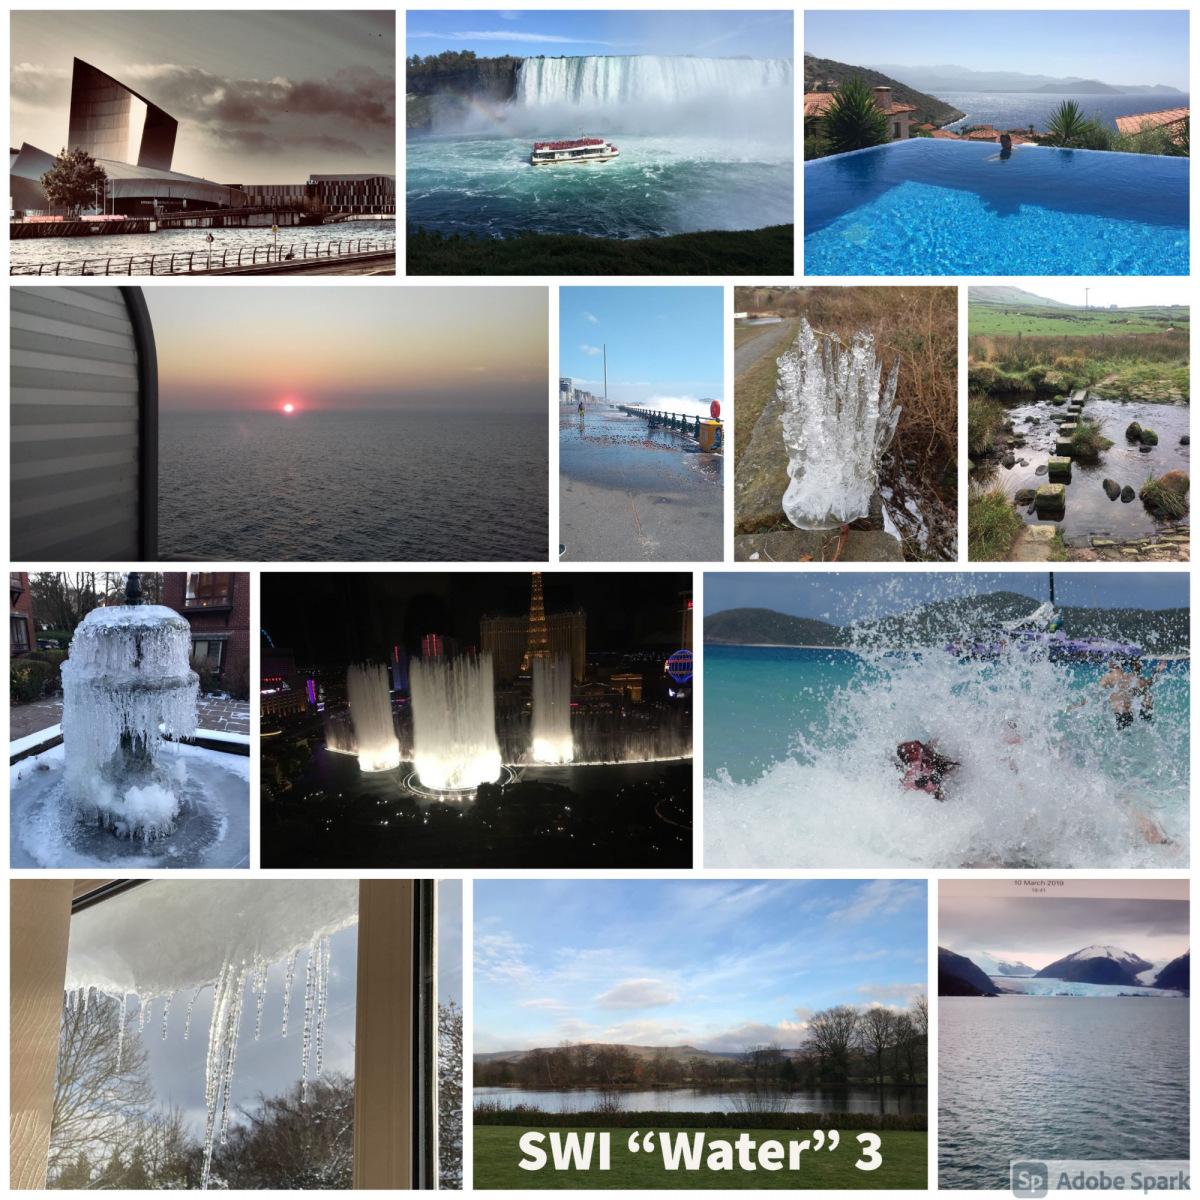 SWI-Water-part3